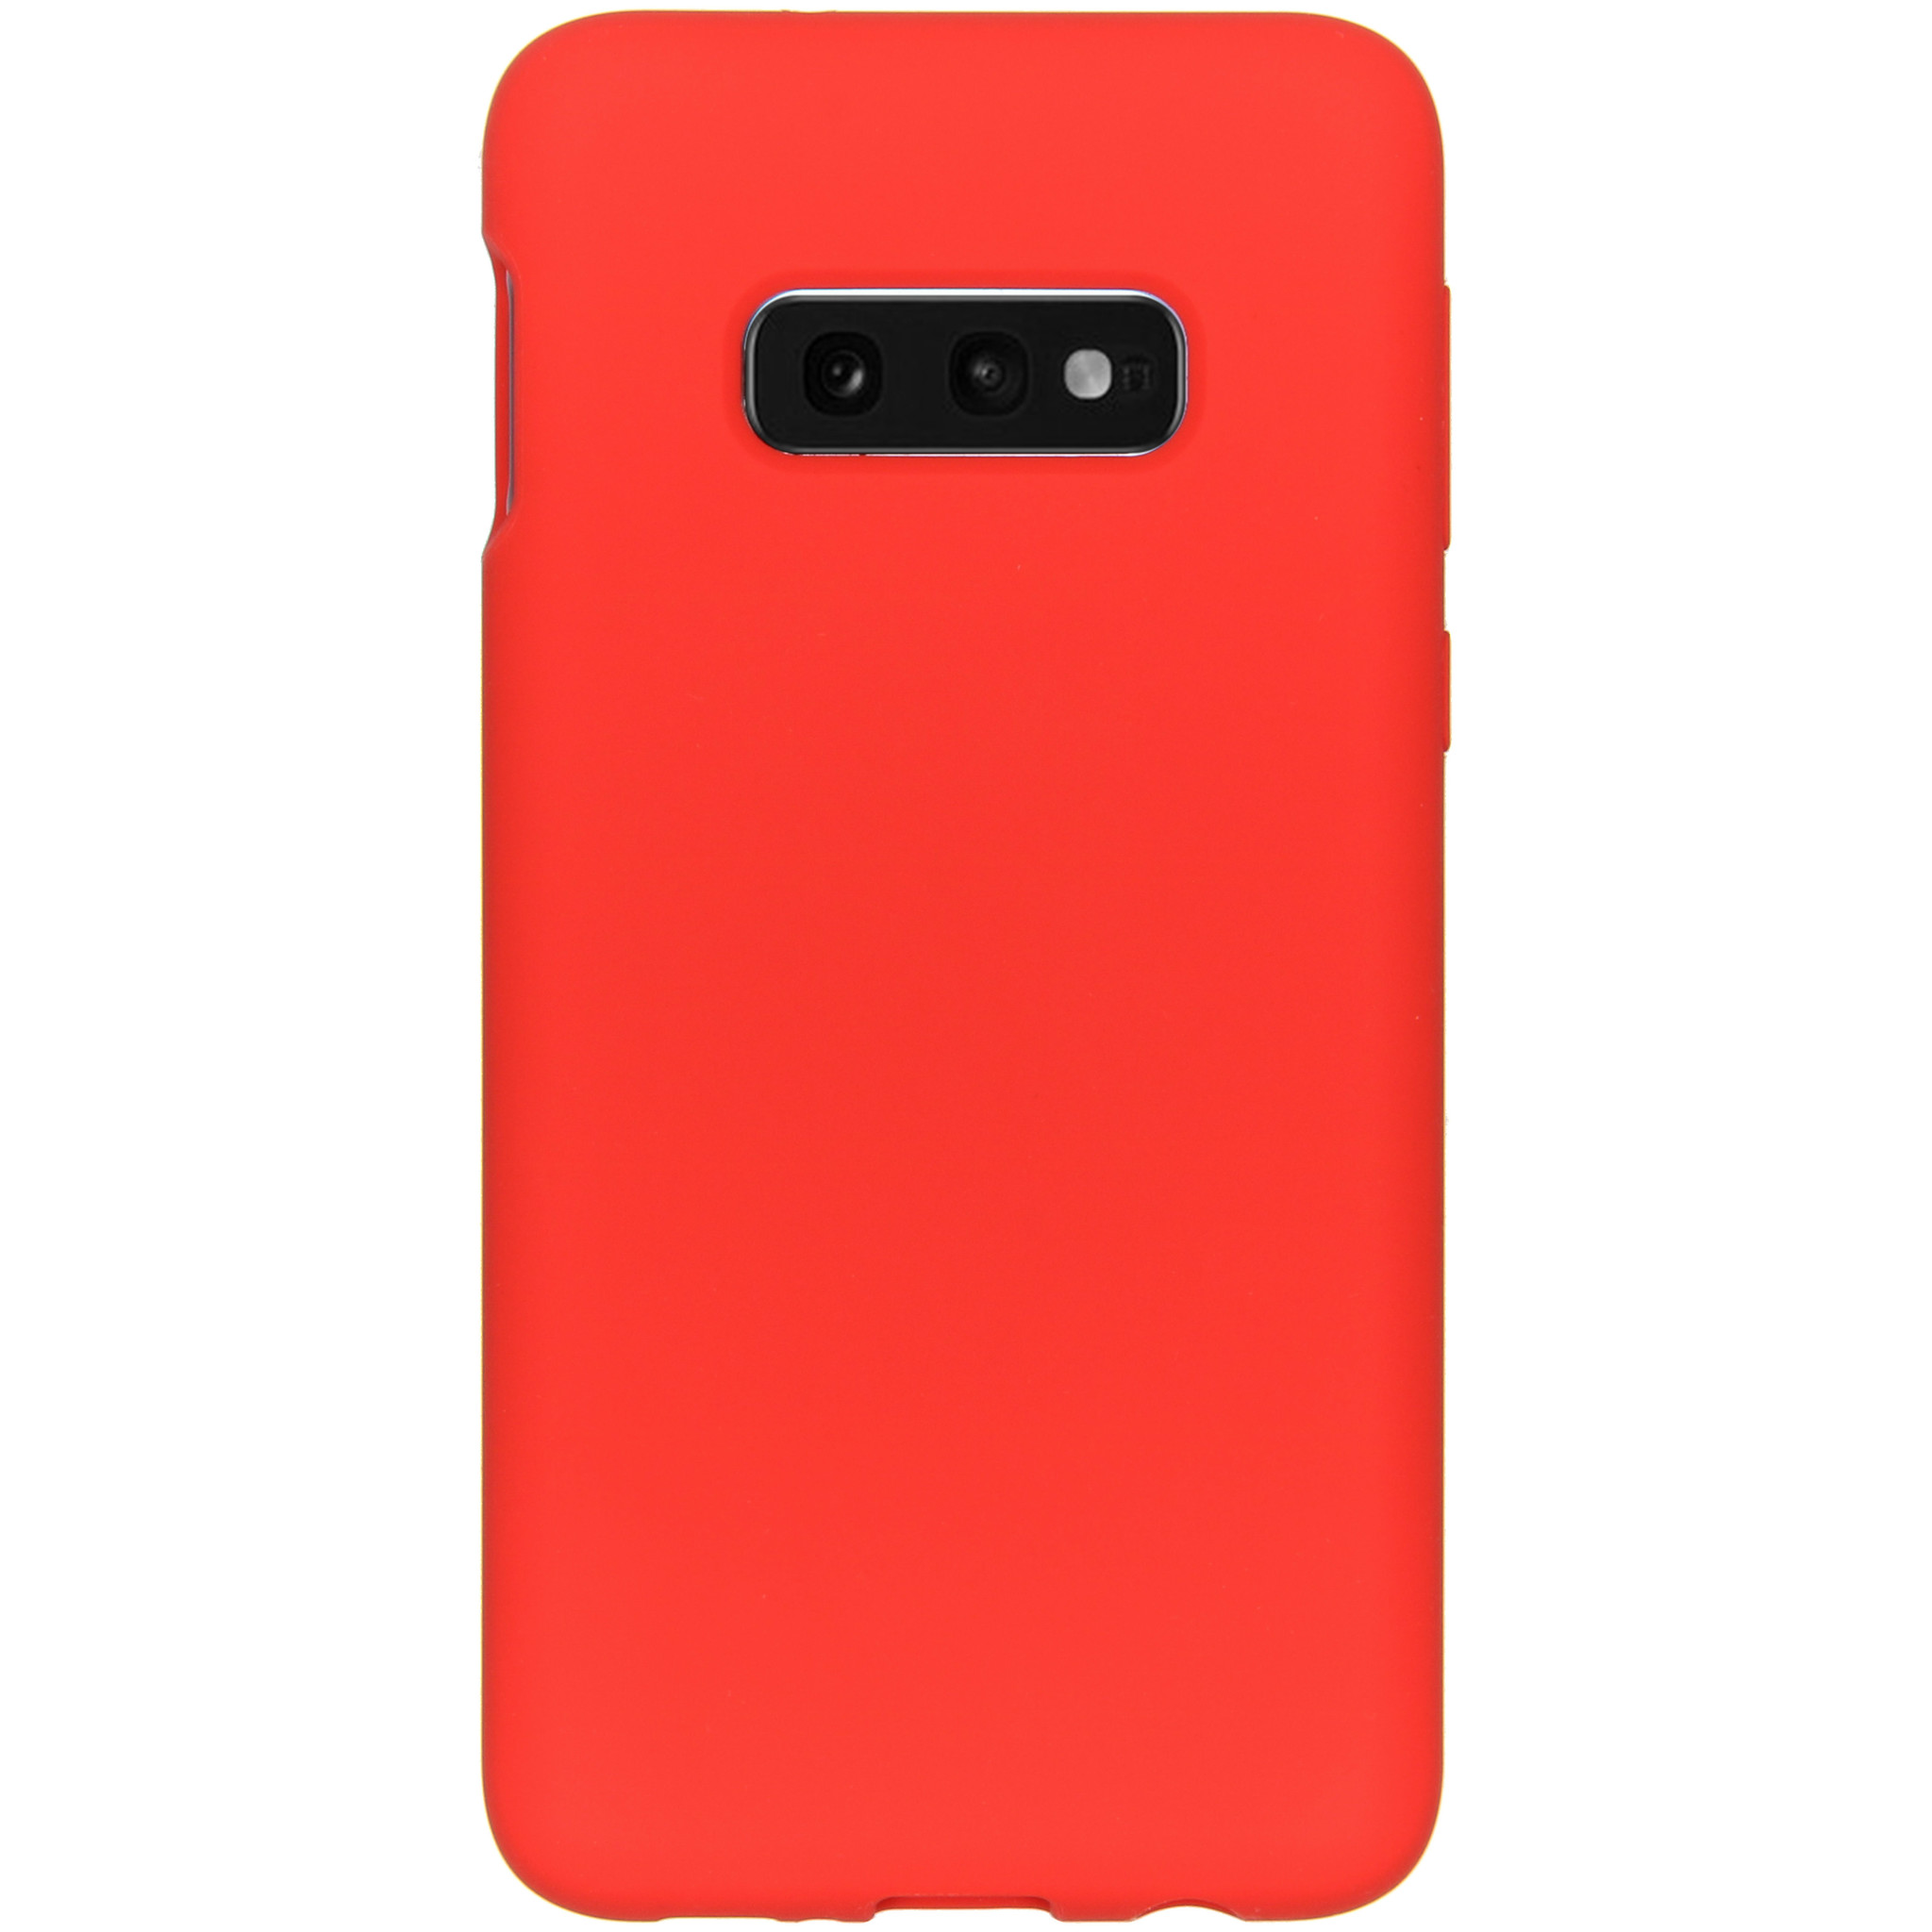 Accezz Liquid Silikoncase Rot für das Samsung Galaxy S10e